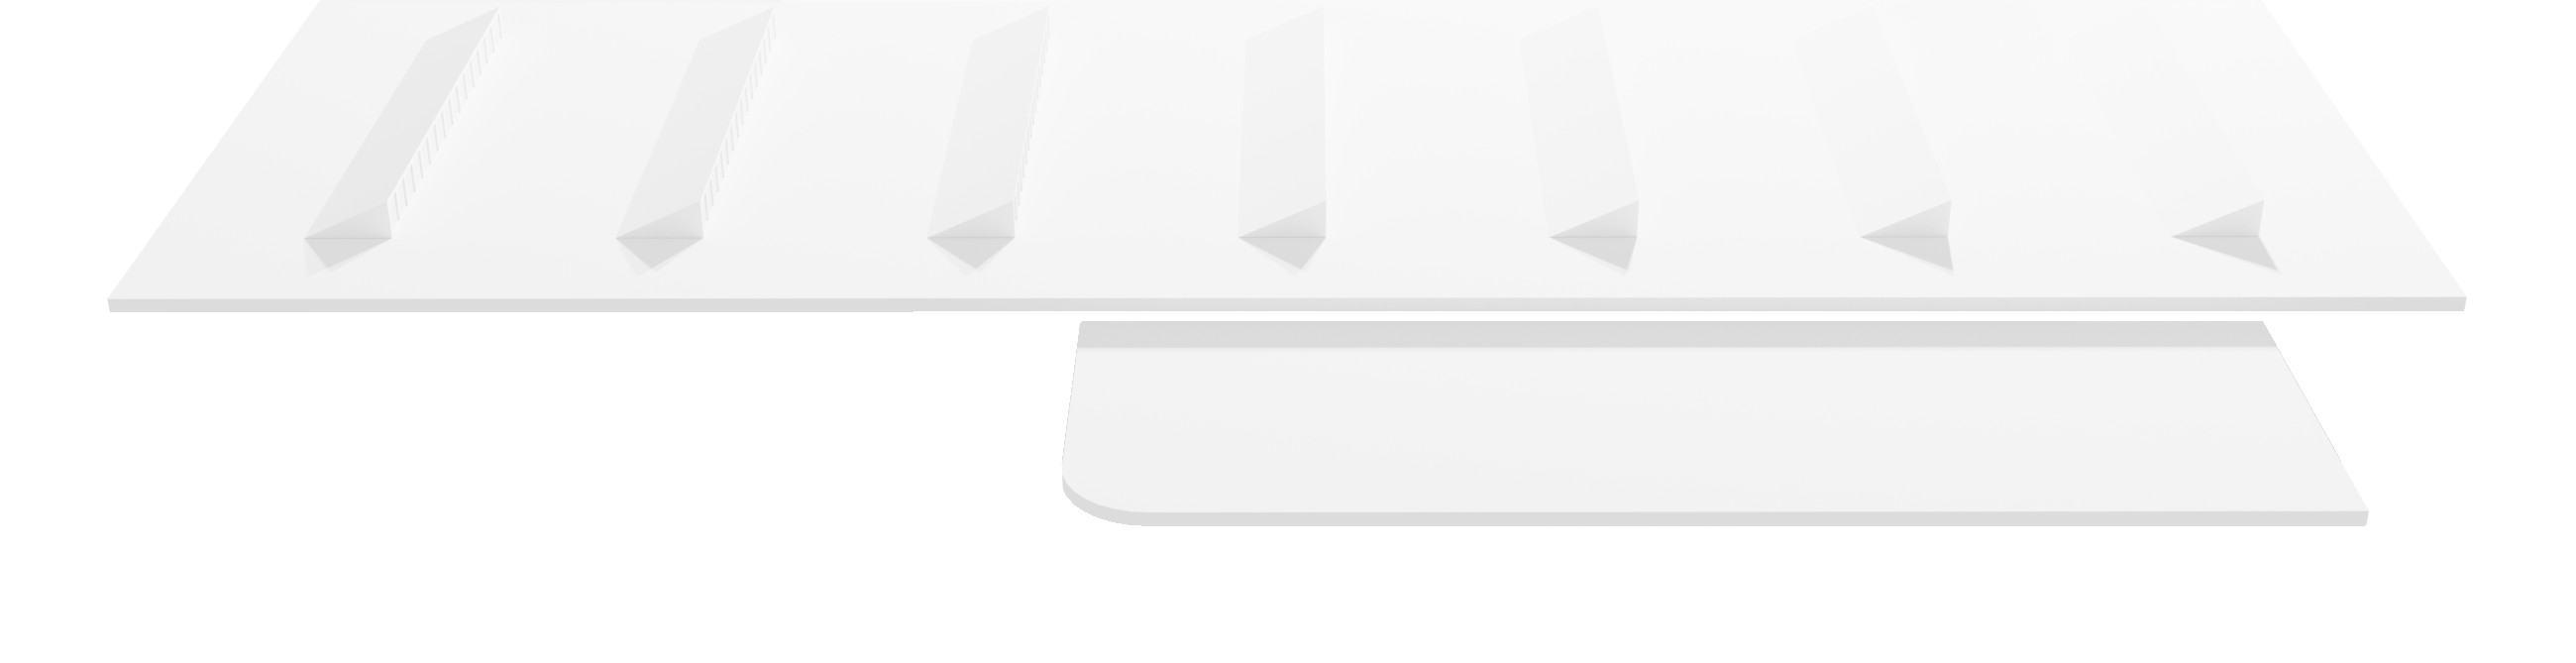 Střecha haly